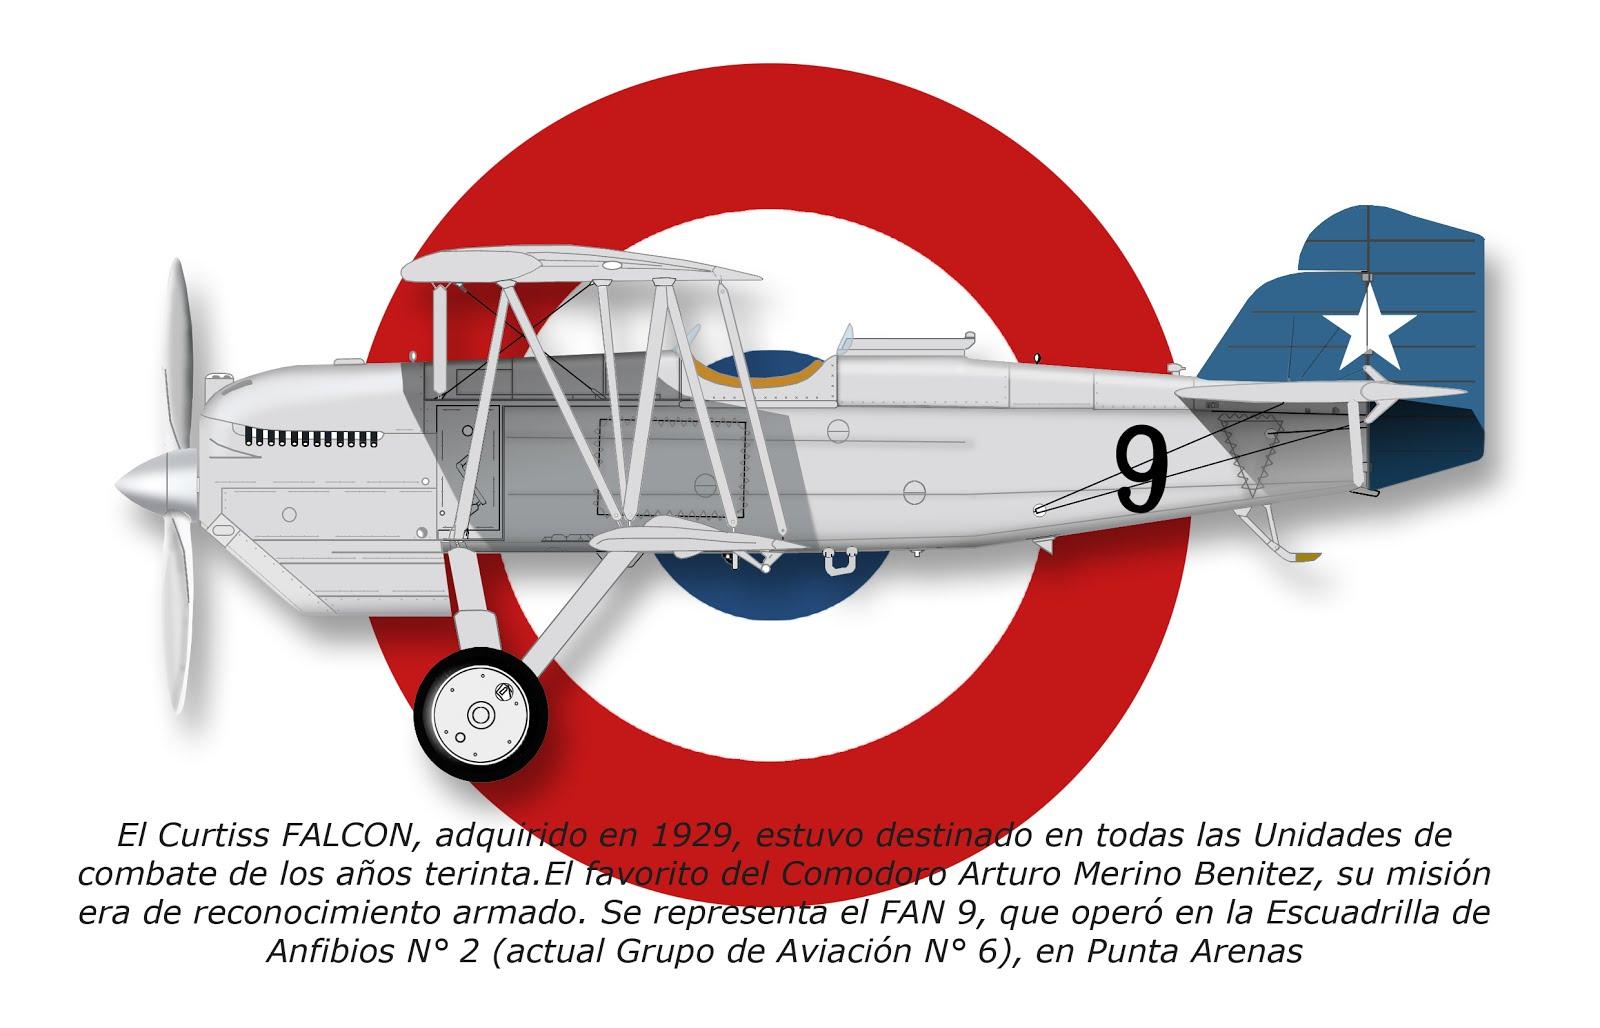 FALCON 9, Escuadrilla de Anfibios N° 2